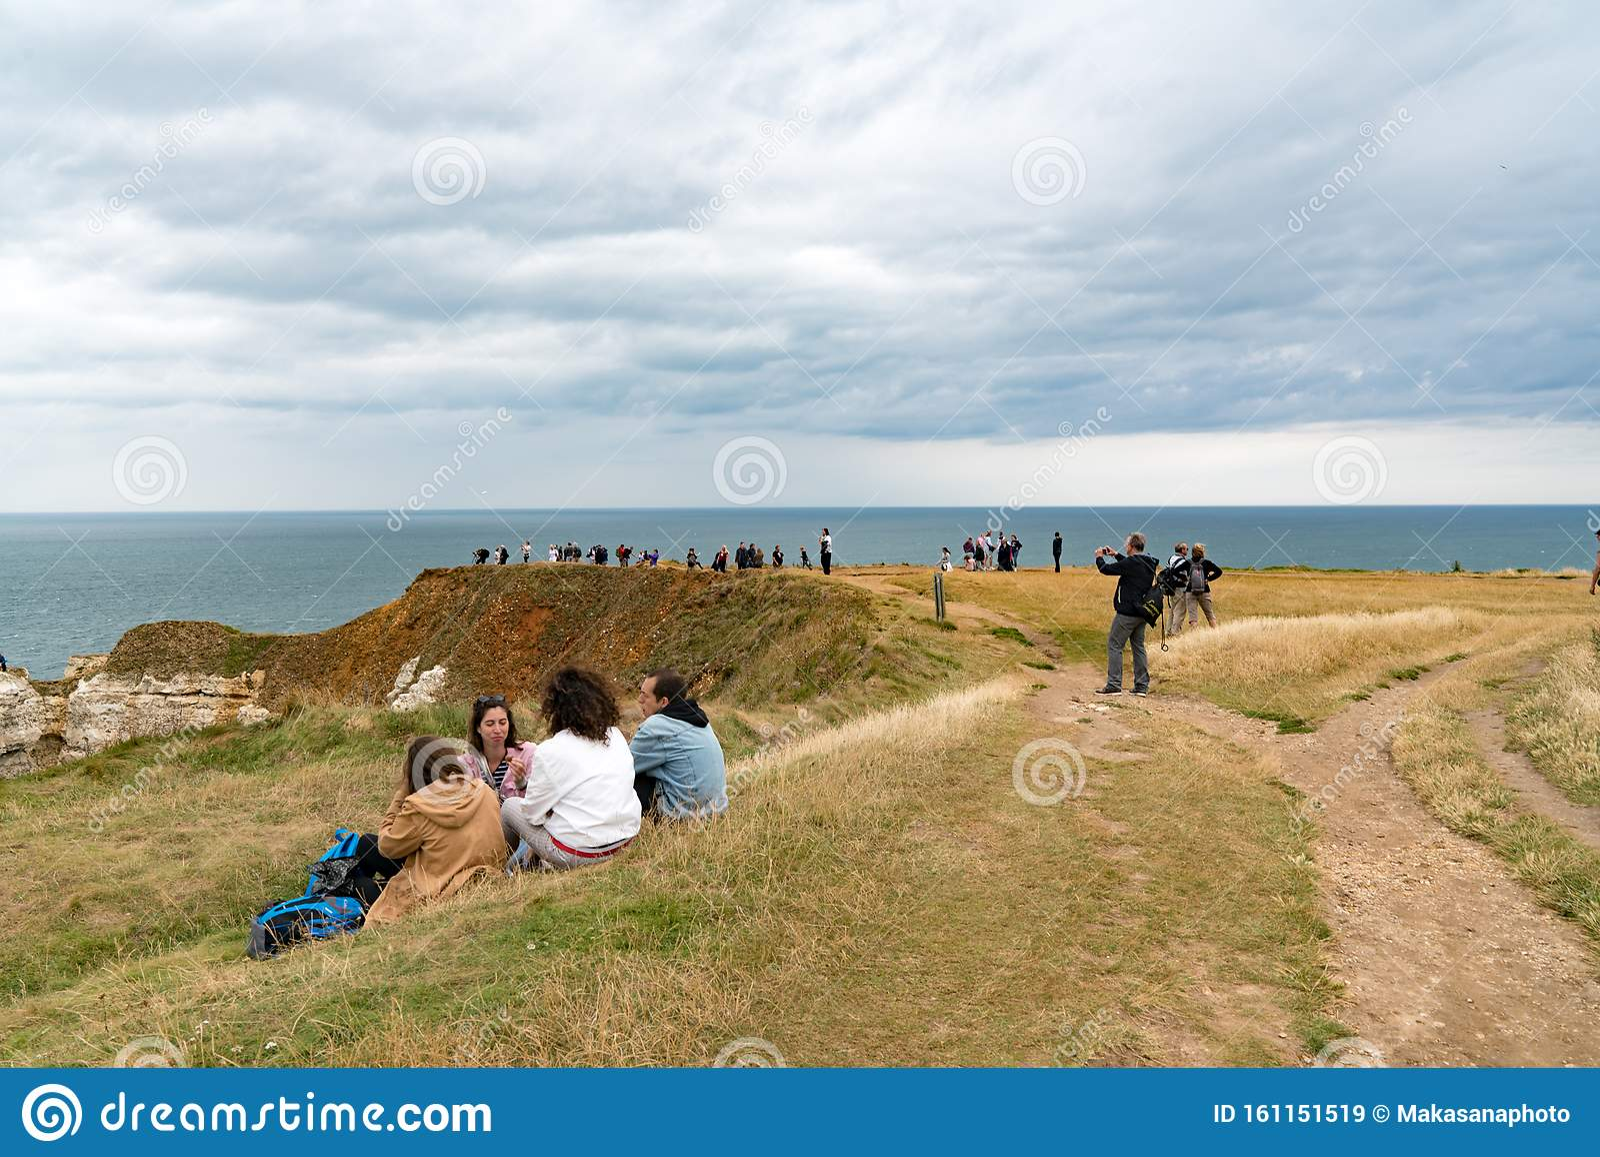 Tourists Enjoy Hiking And Picknicking On The Normandy Coast Along